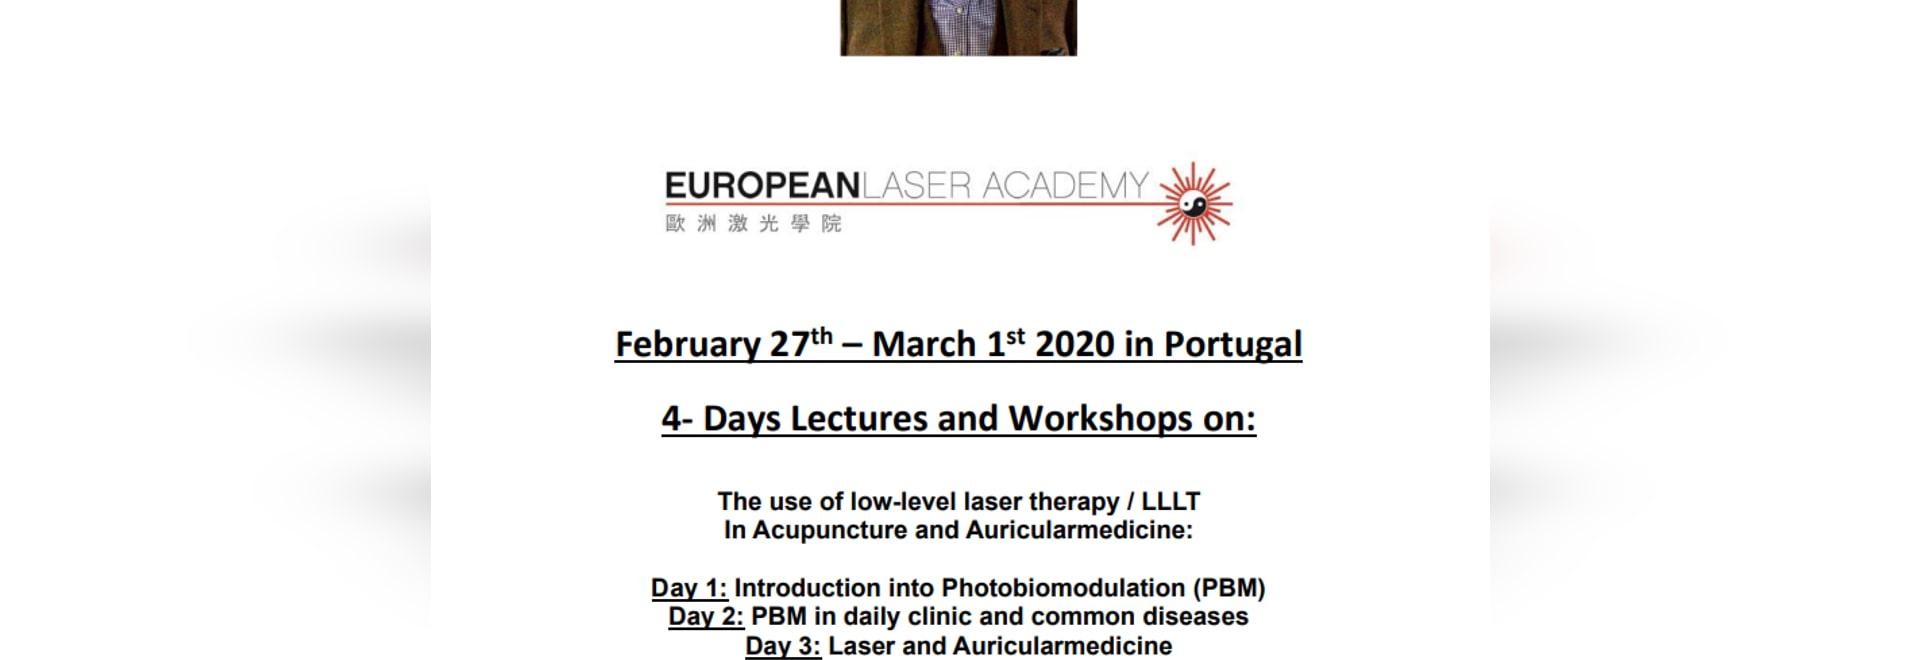 Laser Seminar at Algarve Portugal from Febr 27 til March 01. by Dr Michael Weber MD CM Acup Laser Specialist from Germany.